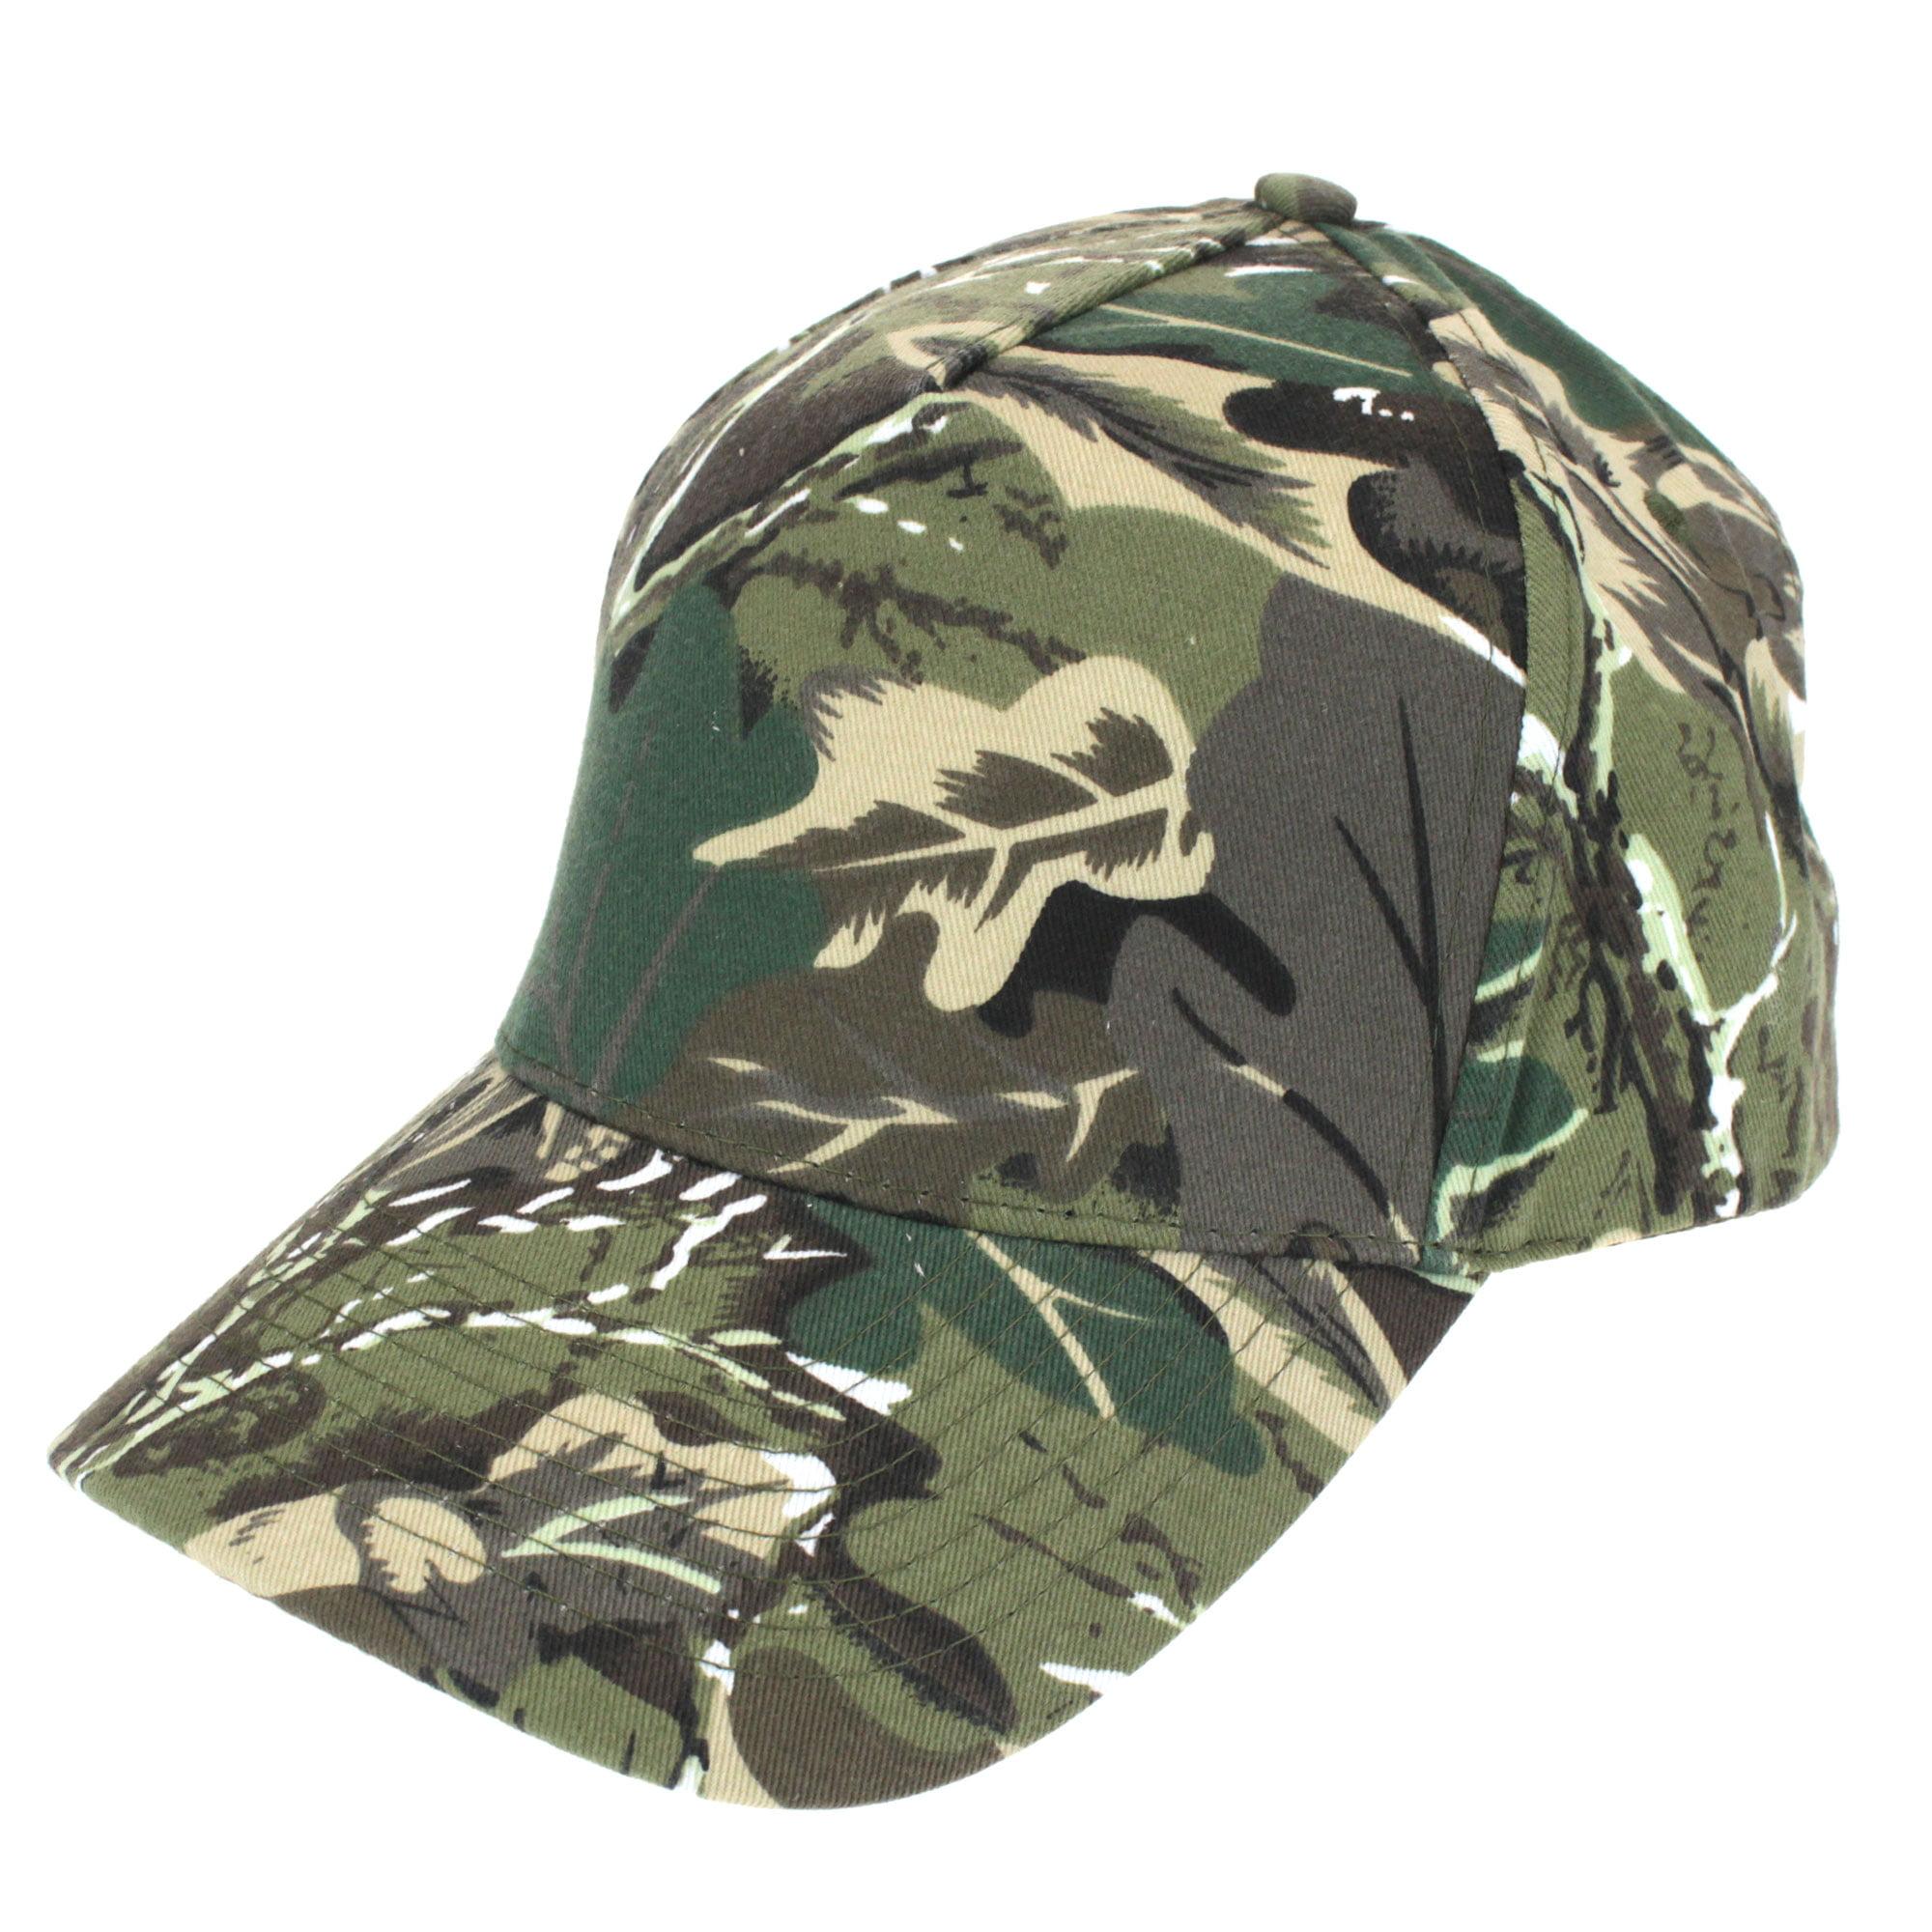 Mens Low Crown 5 Panel Camouflage Twill Baseball Cap Olive Foliage Camo -  Walmart.com 7d2383efd26